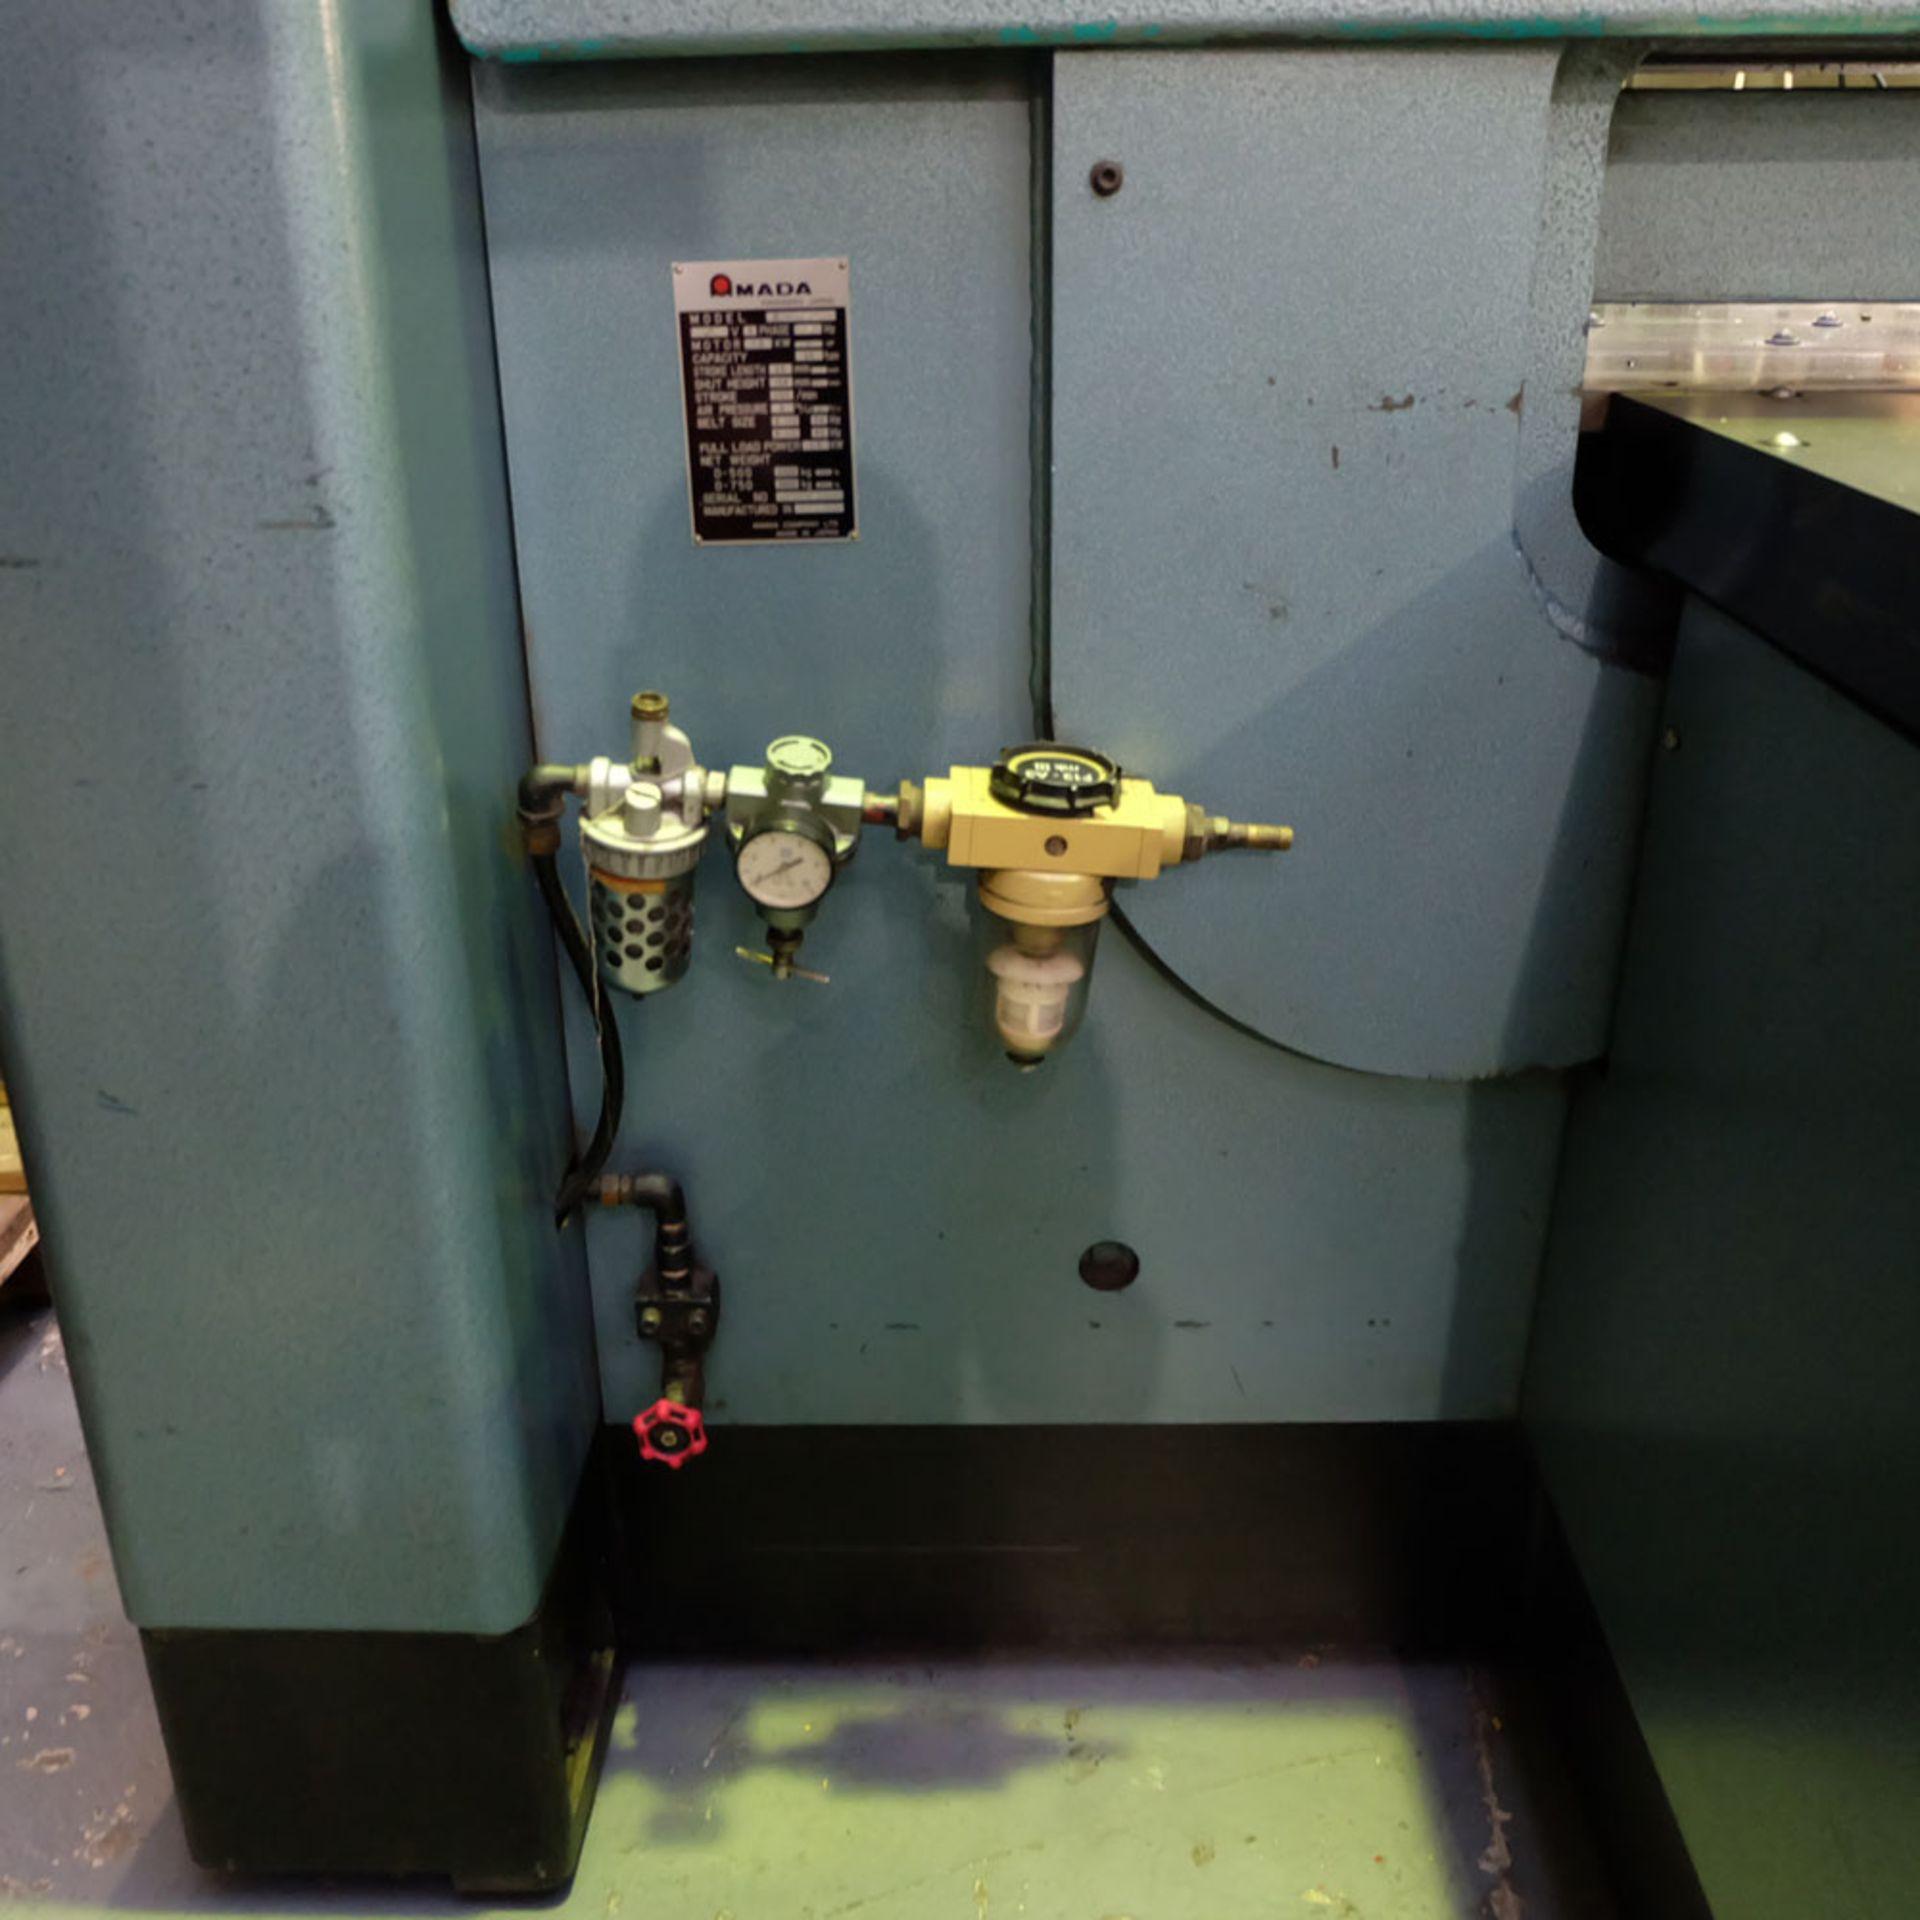 Amada D-750 Duplicator Punching Machine. - Image 12 of 18